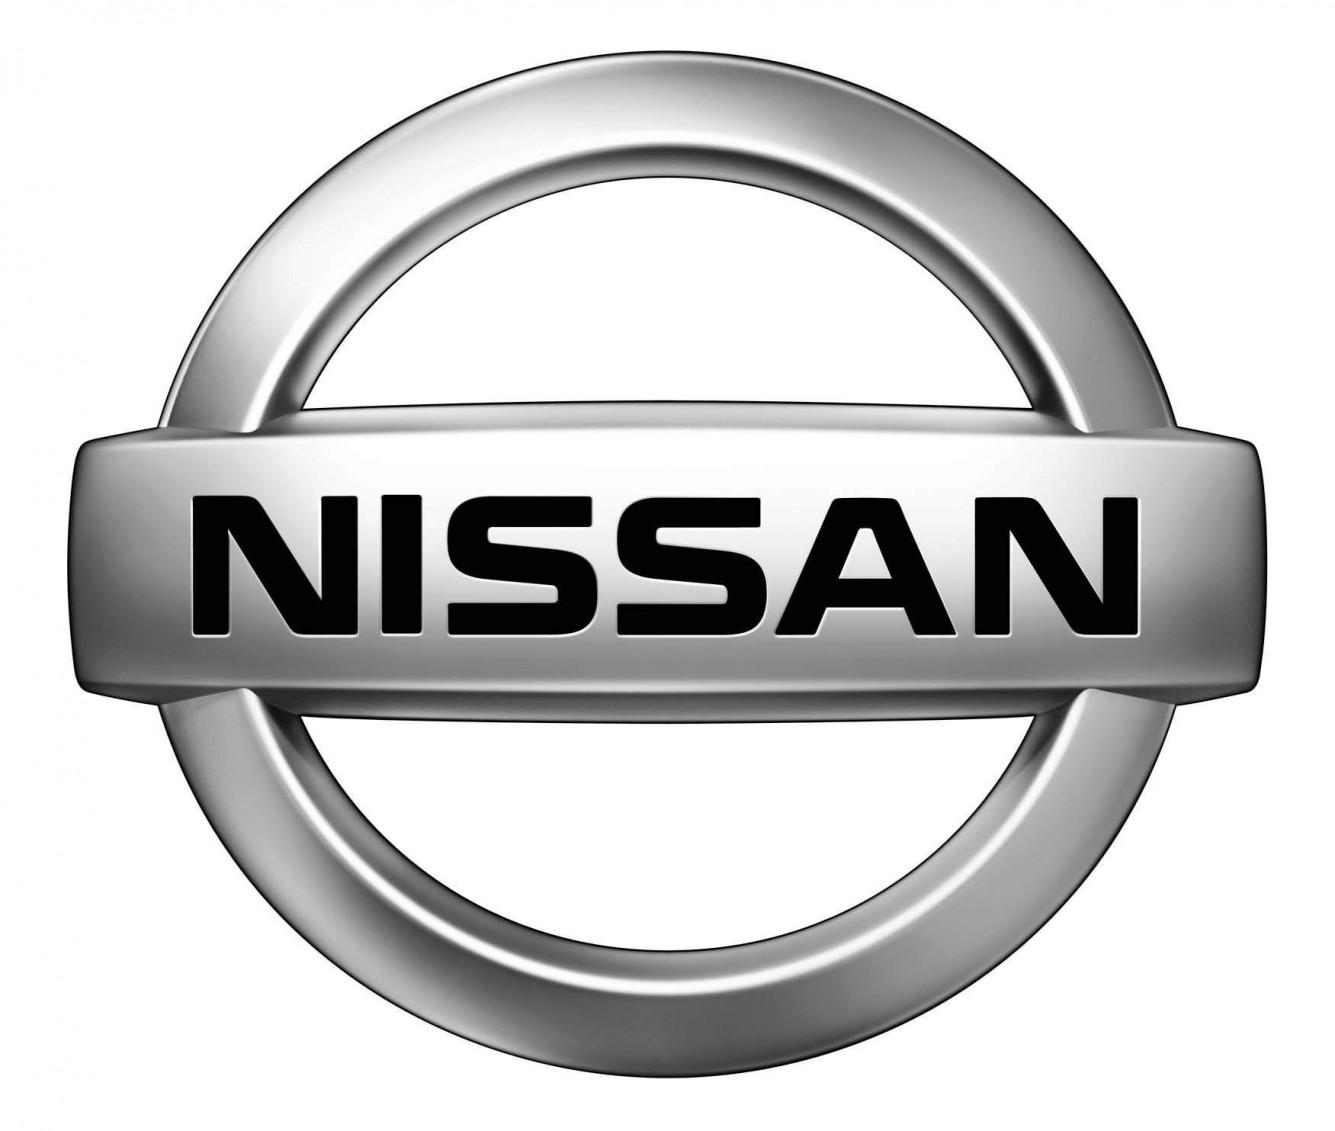 Nissan Convertible Hydraulic Rebuild/Upgrade Service